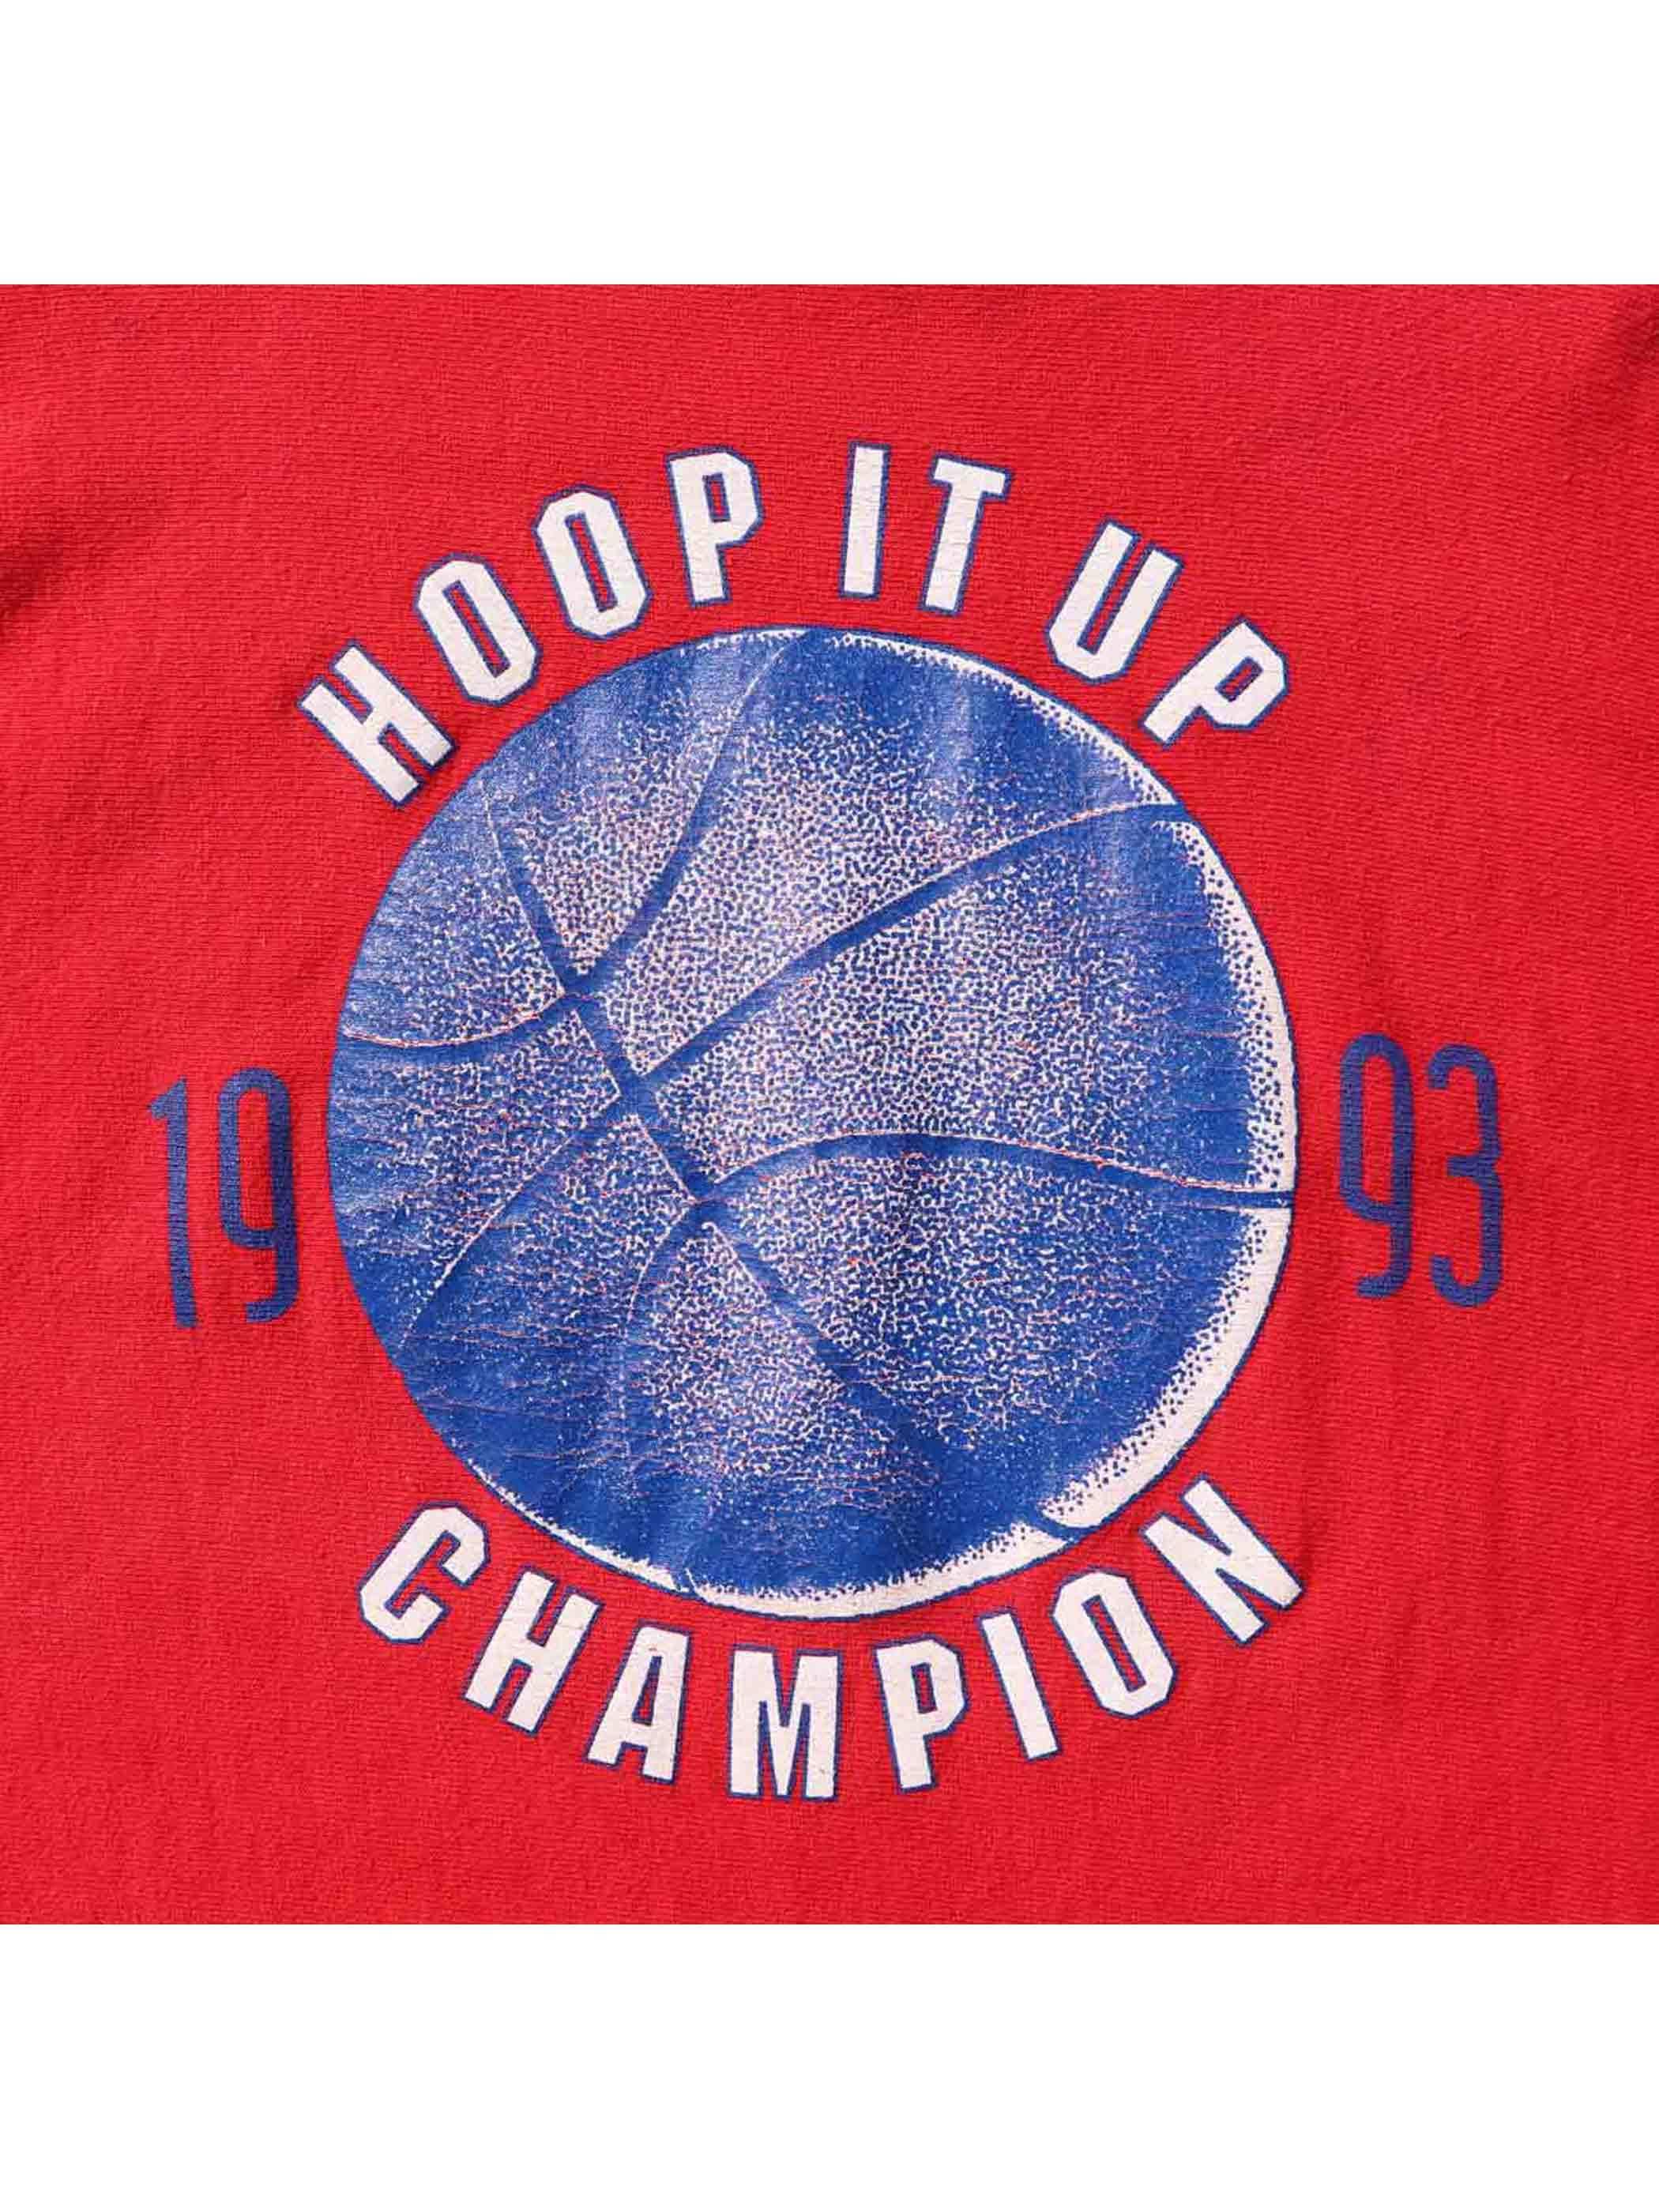 90's CHAMPION USA製 バスケットボール リバースウィーブ [XL]